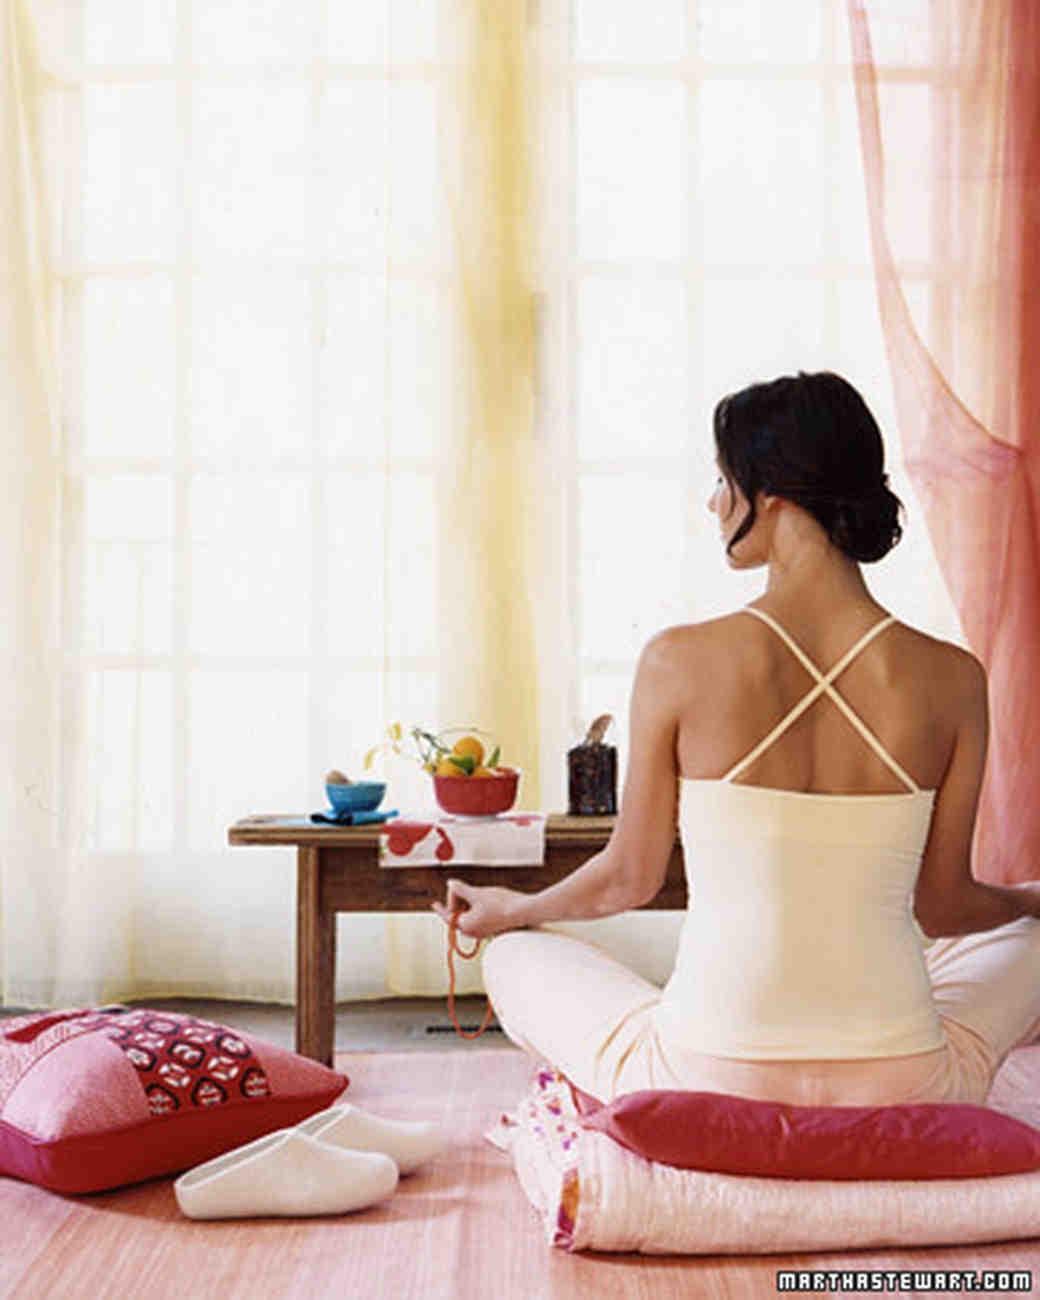 woman yoga pose meditate